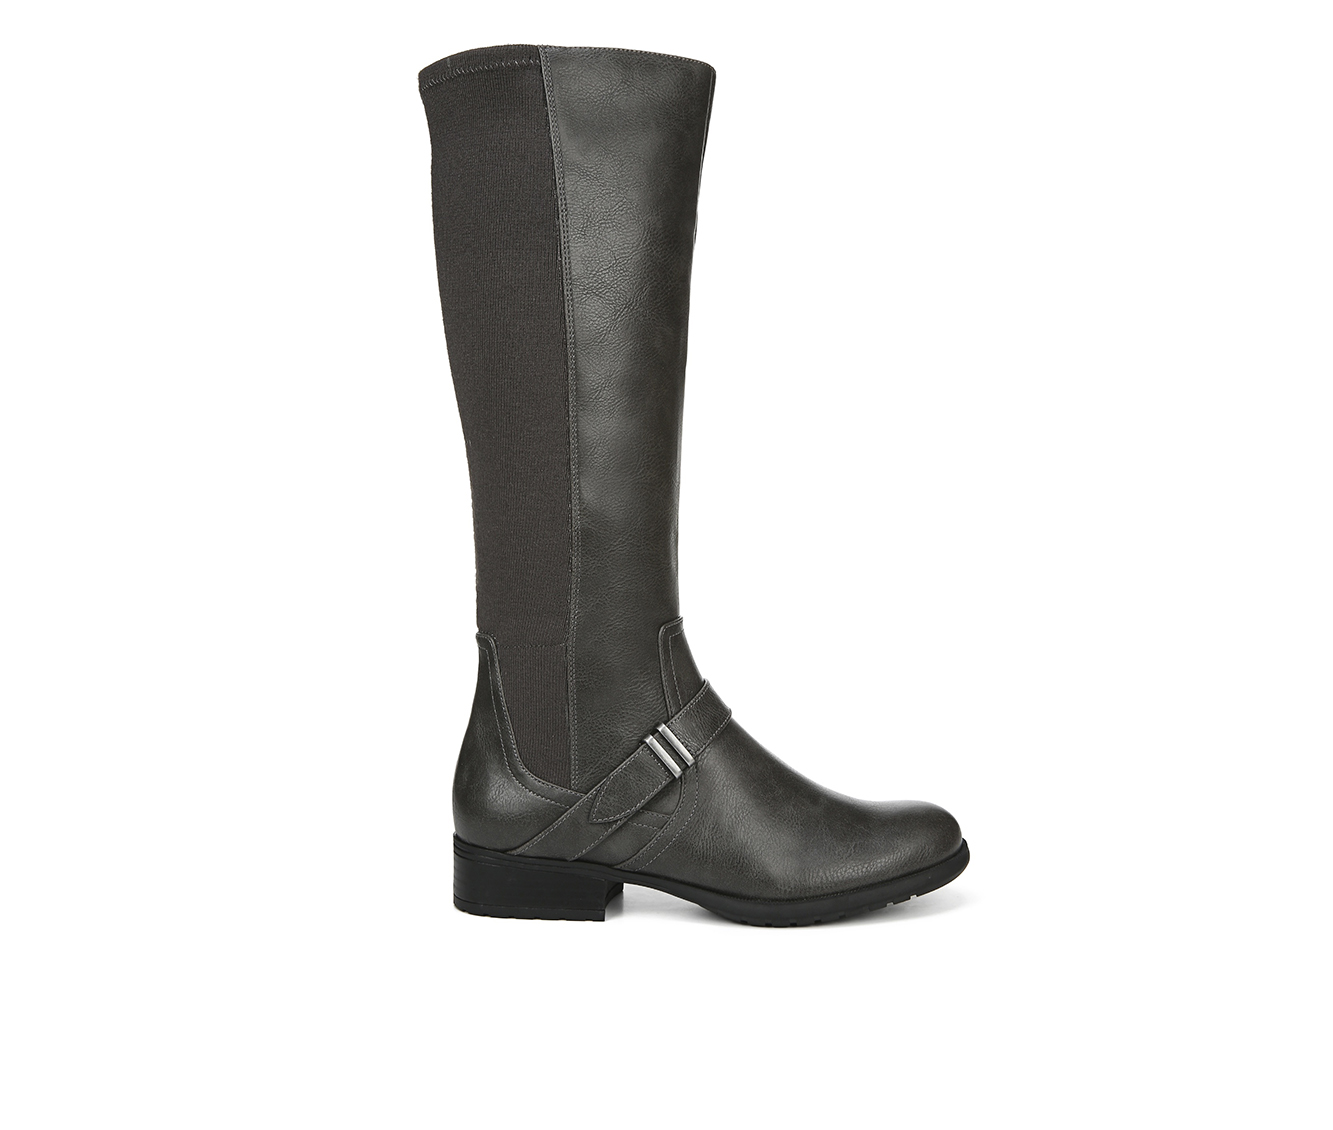 LifeStride Xtra Women's Boot (Gray)